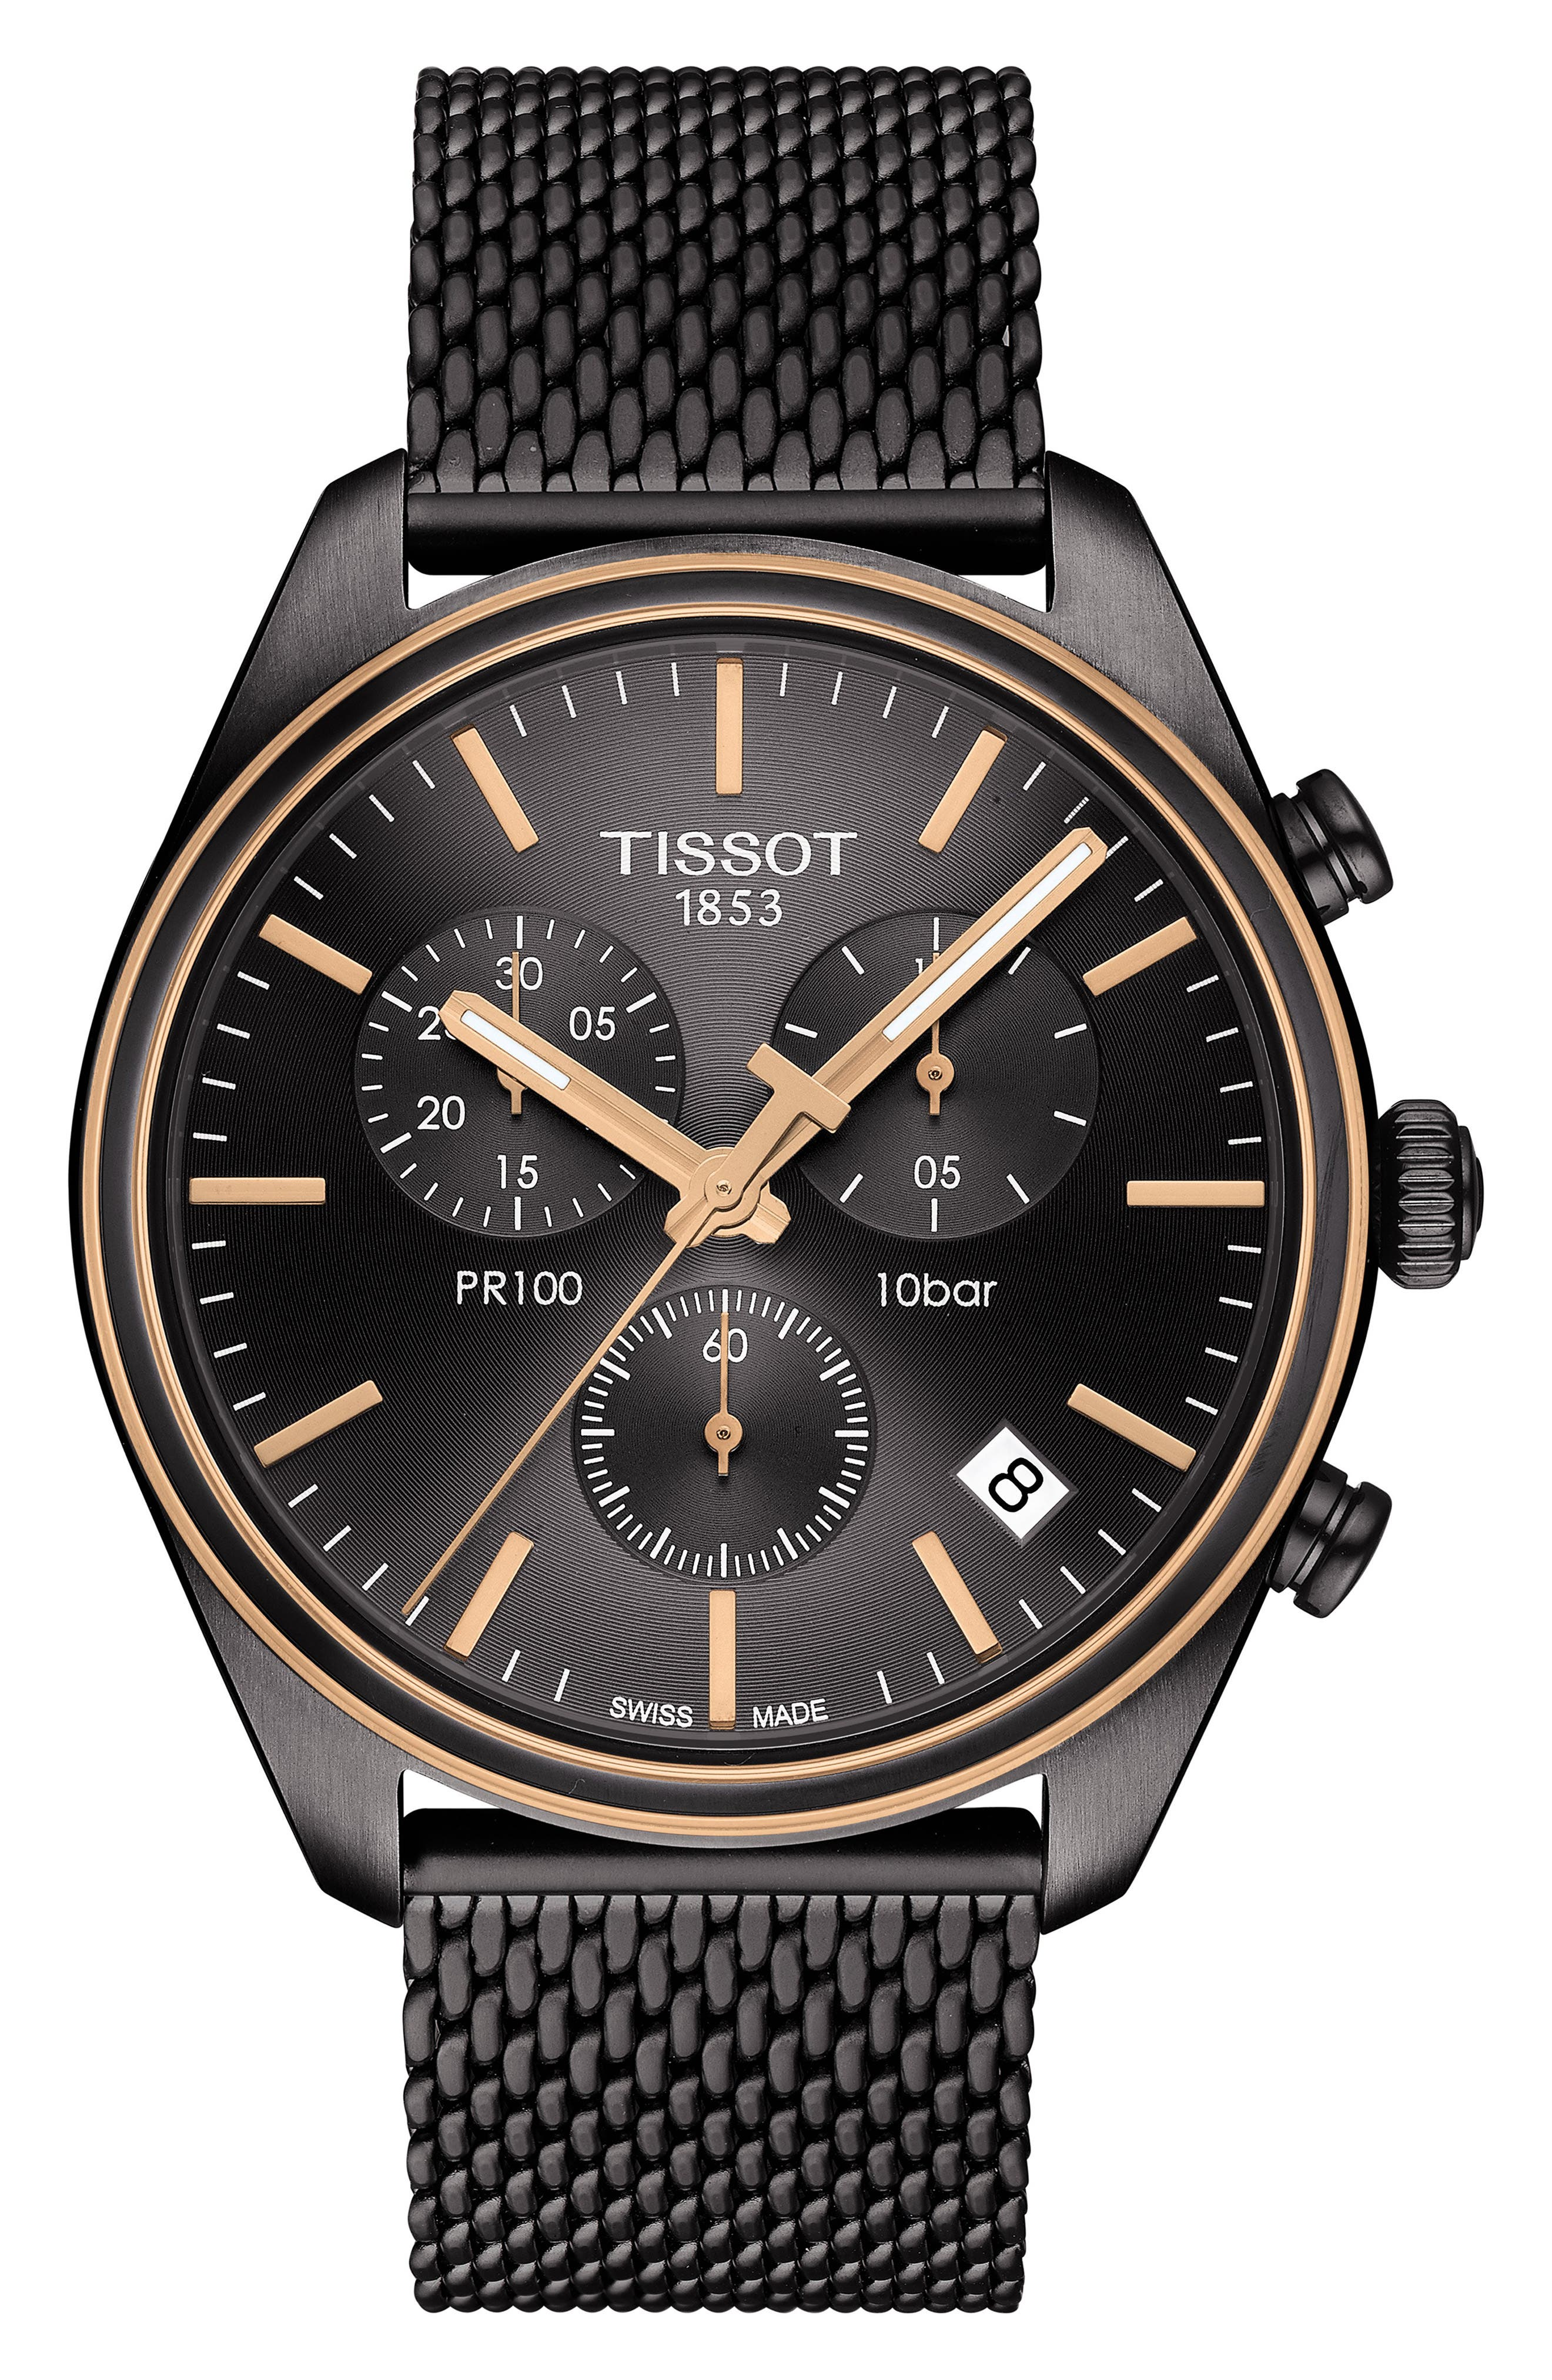 TISSOT, T-Classic PR 100 Chronograph Mesh Bracelet Watch, 41mm, Main thumbnail 1, color, SILVER/ ANTHRACITE/ ROSE GOLD